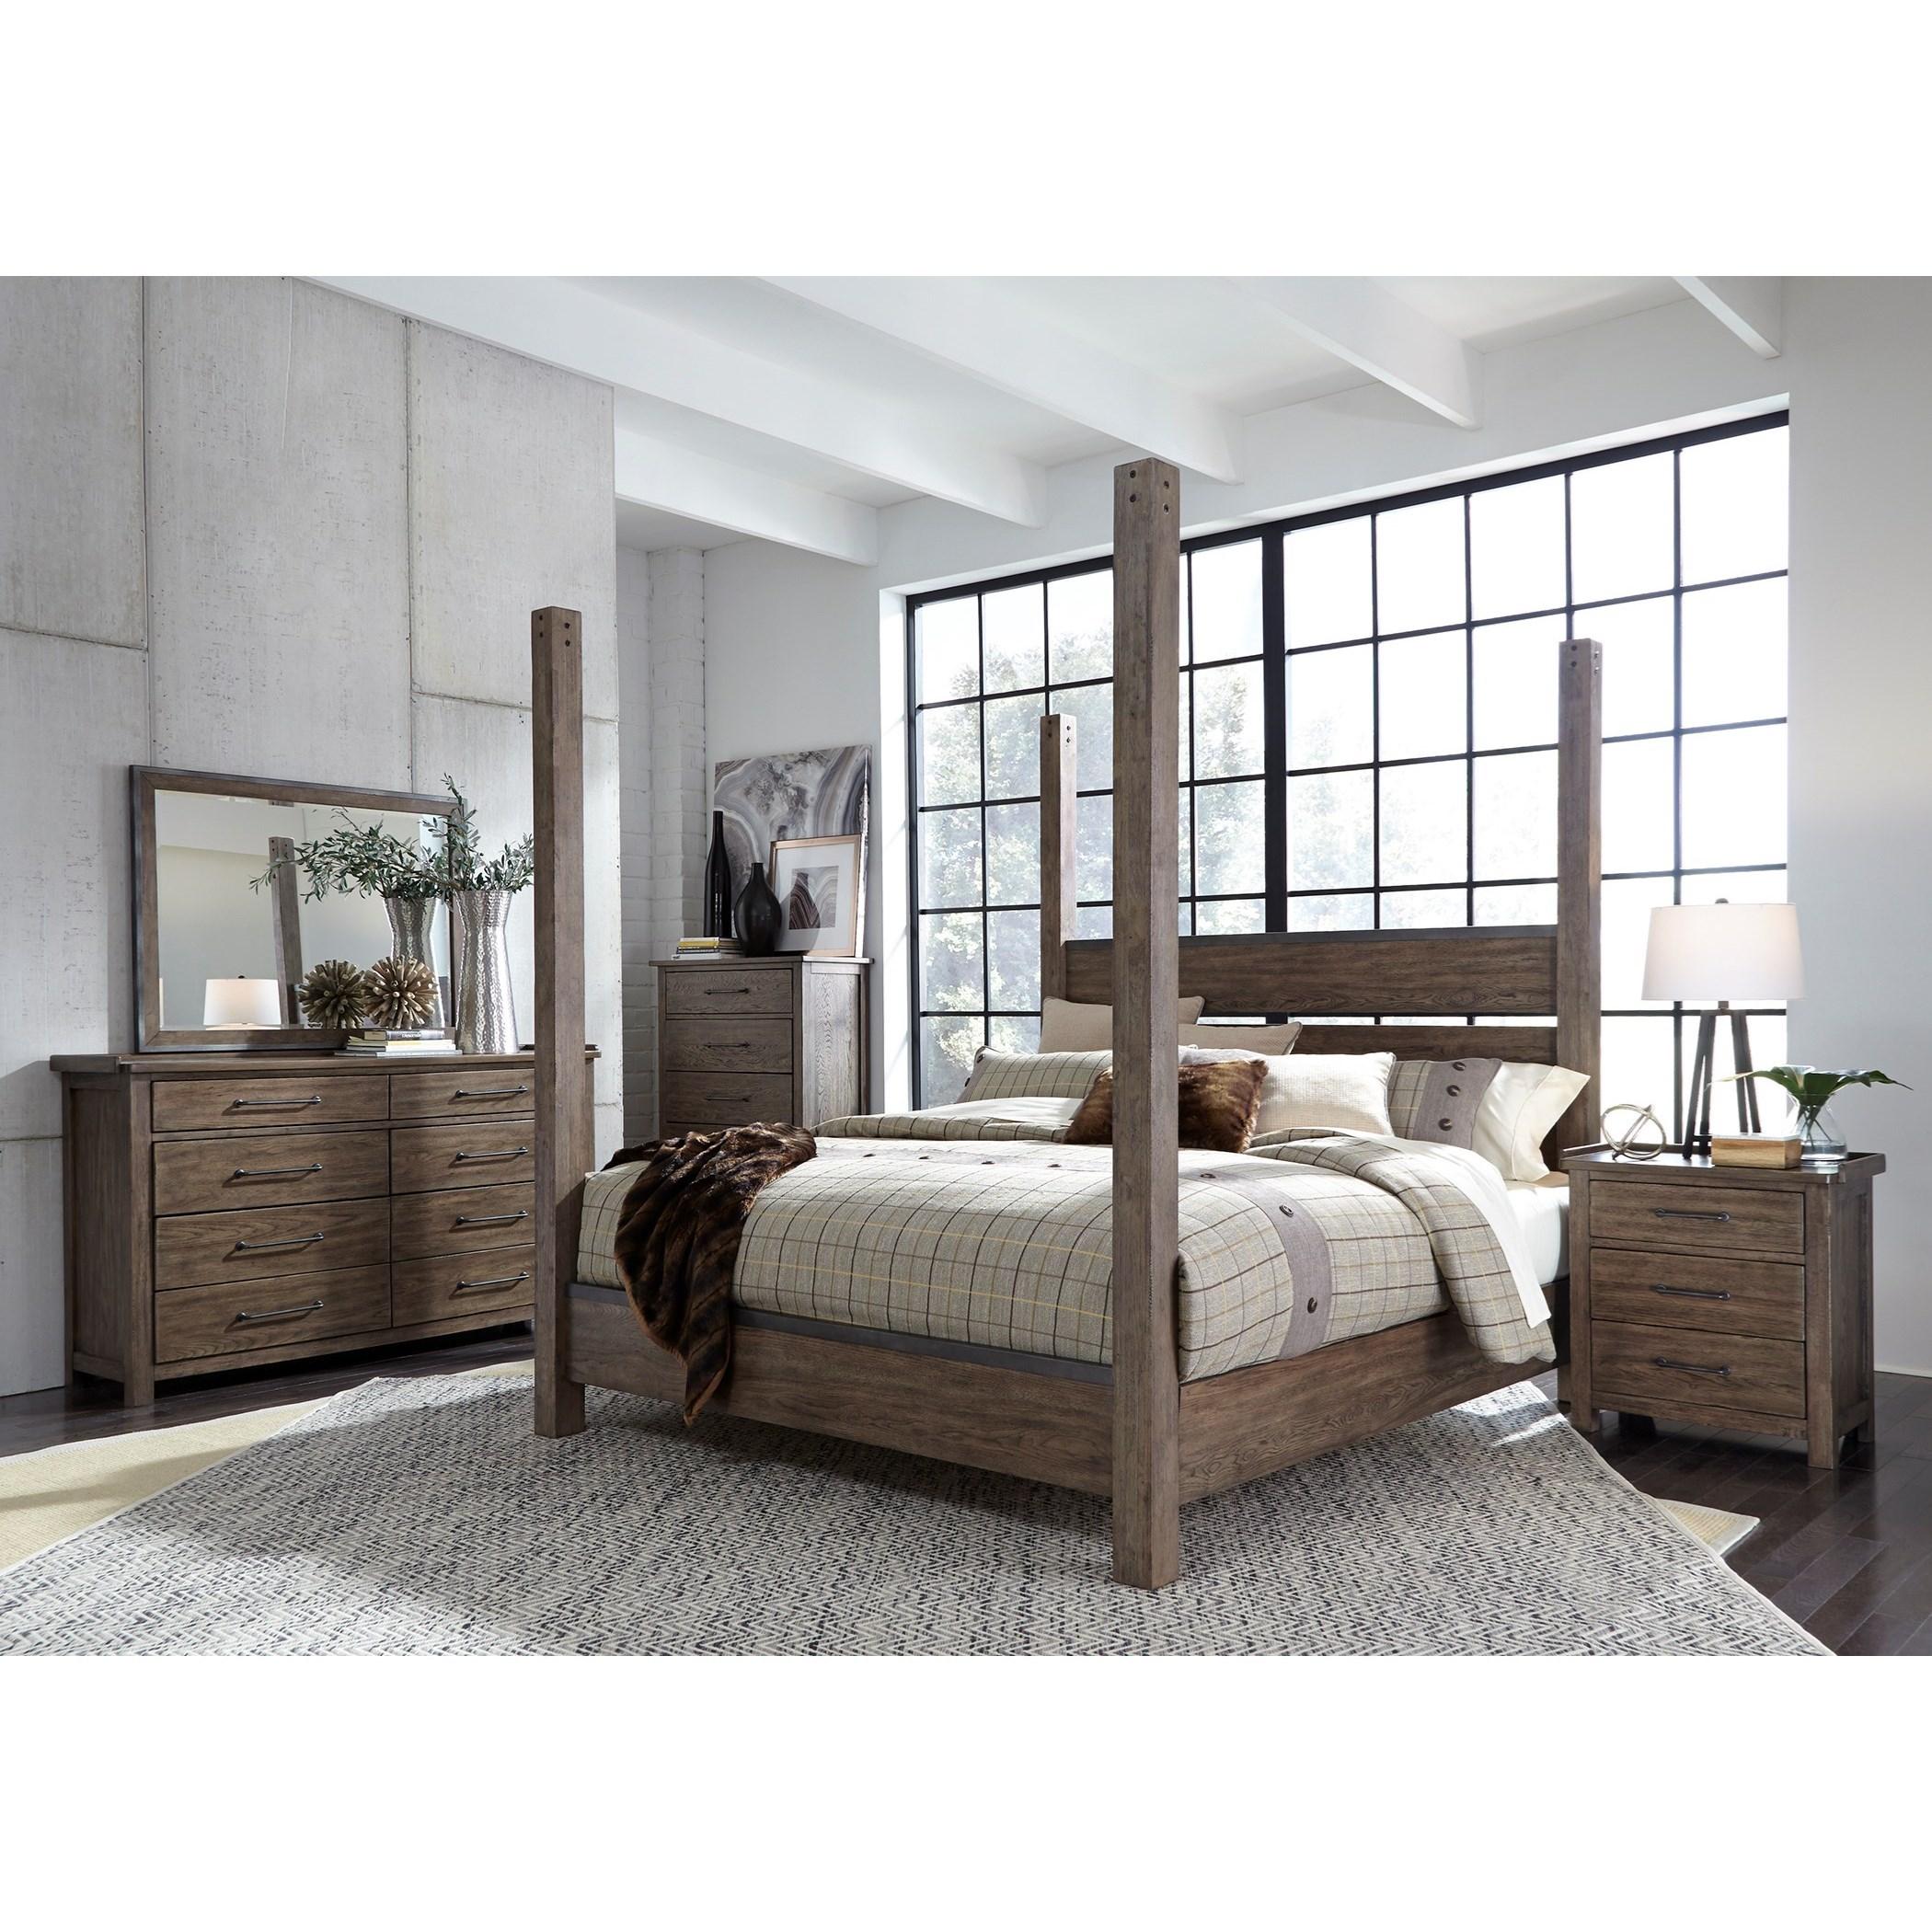 Sarah Randolph Designs Sonoma Road King Bedroom Group